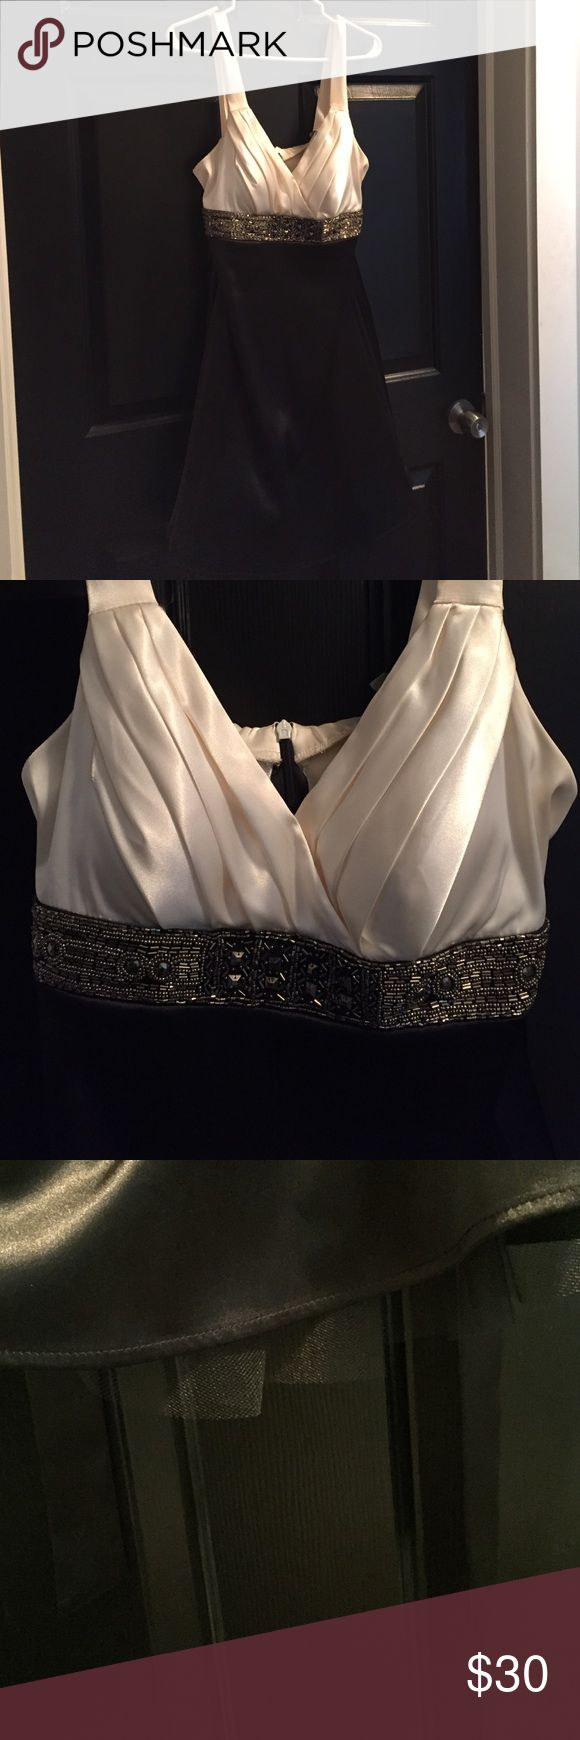 Más de 25 ideas increíbles sobre Black and white occasion dresses ...